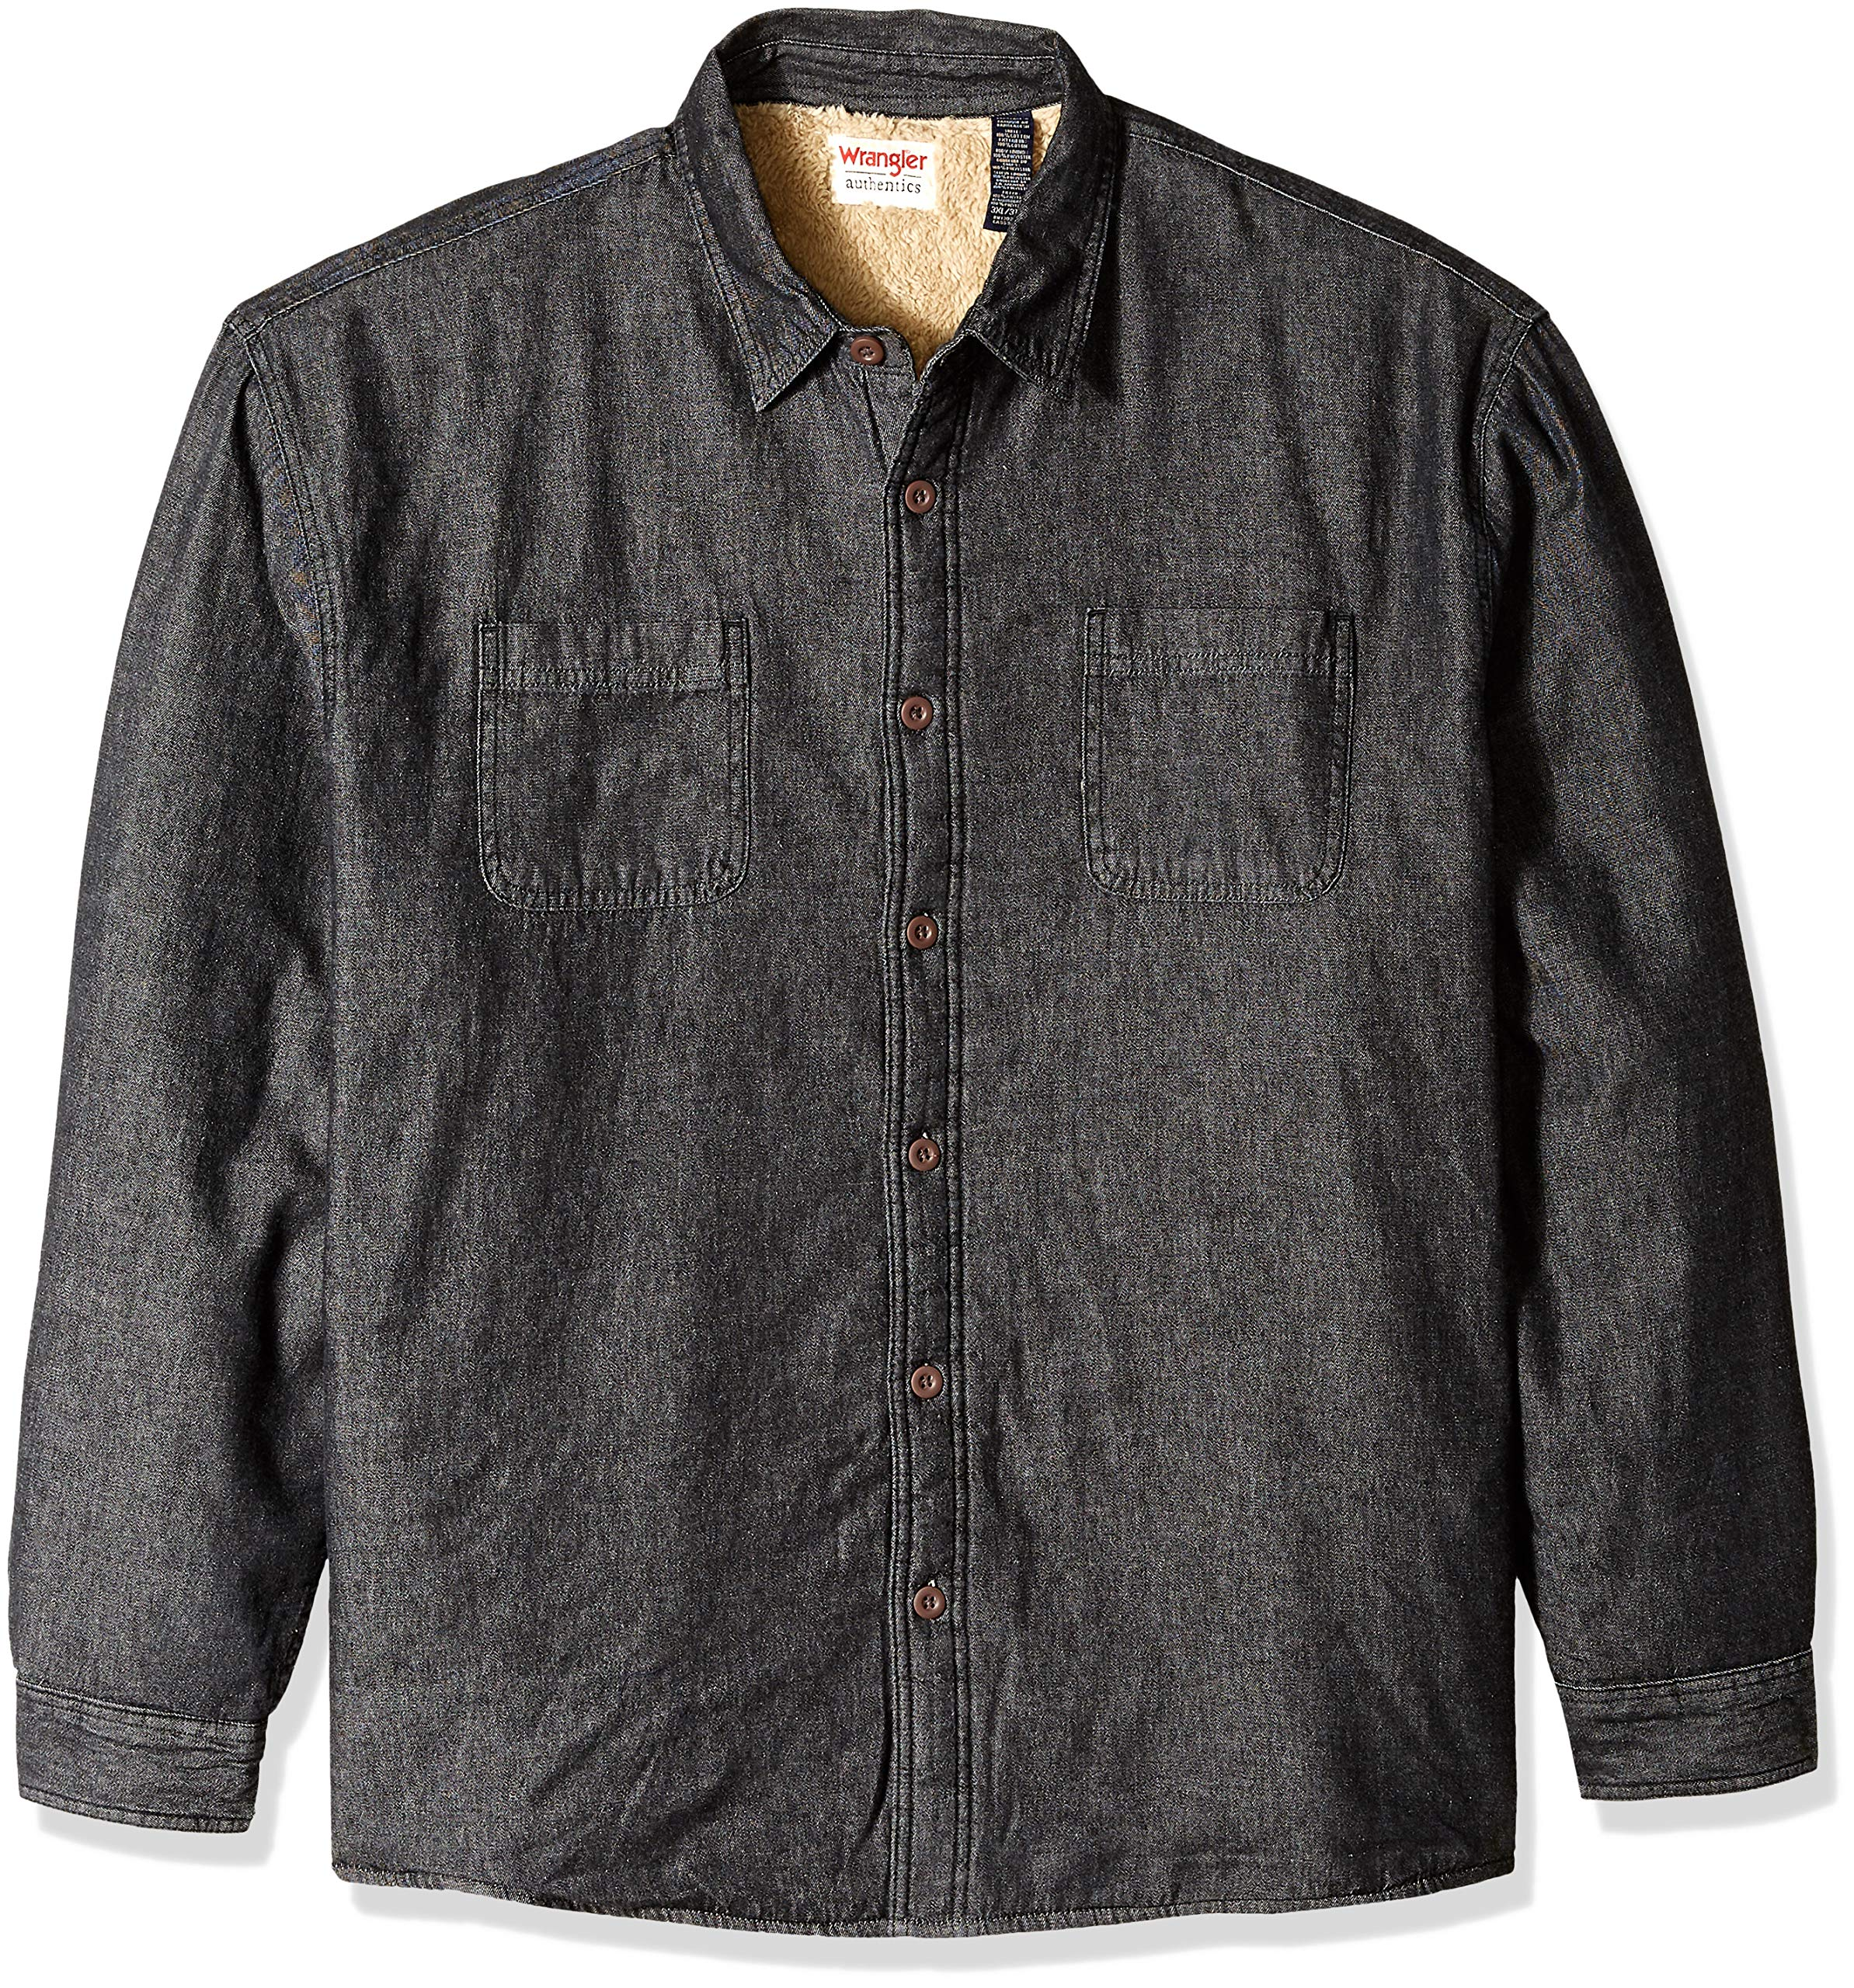 Wrangler Authentics Men's Big & Tall Long Sleeve Sherpa Lined Flannel Shirt Jacket, black denim, 3XL by Wrangler